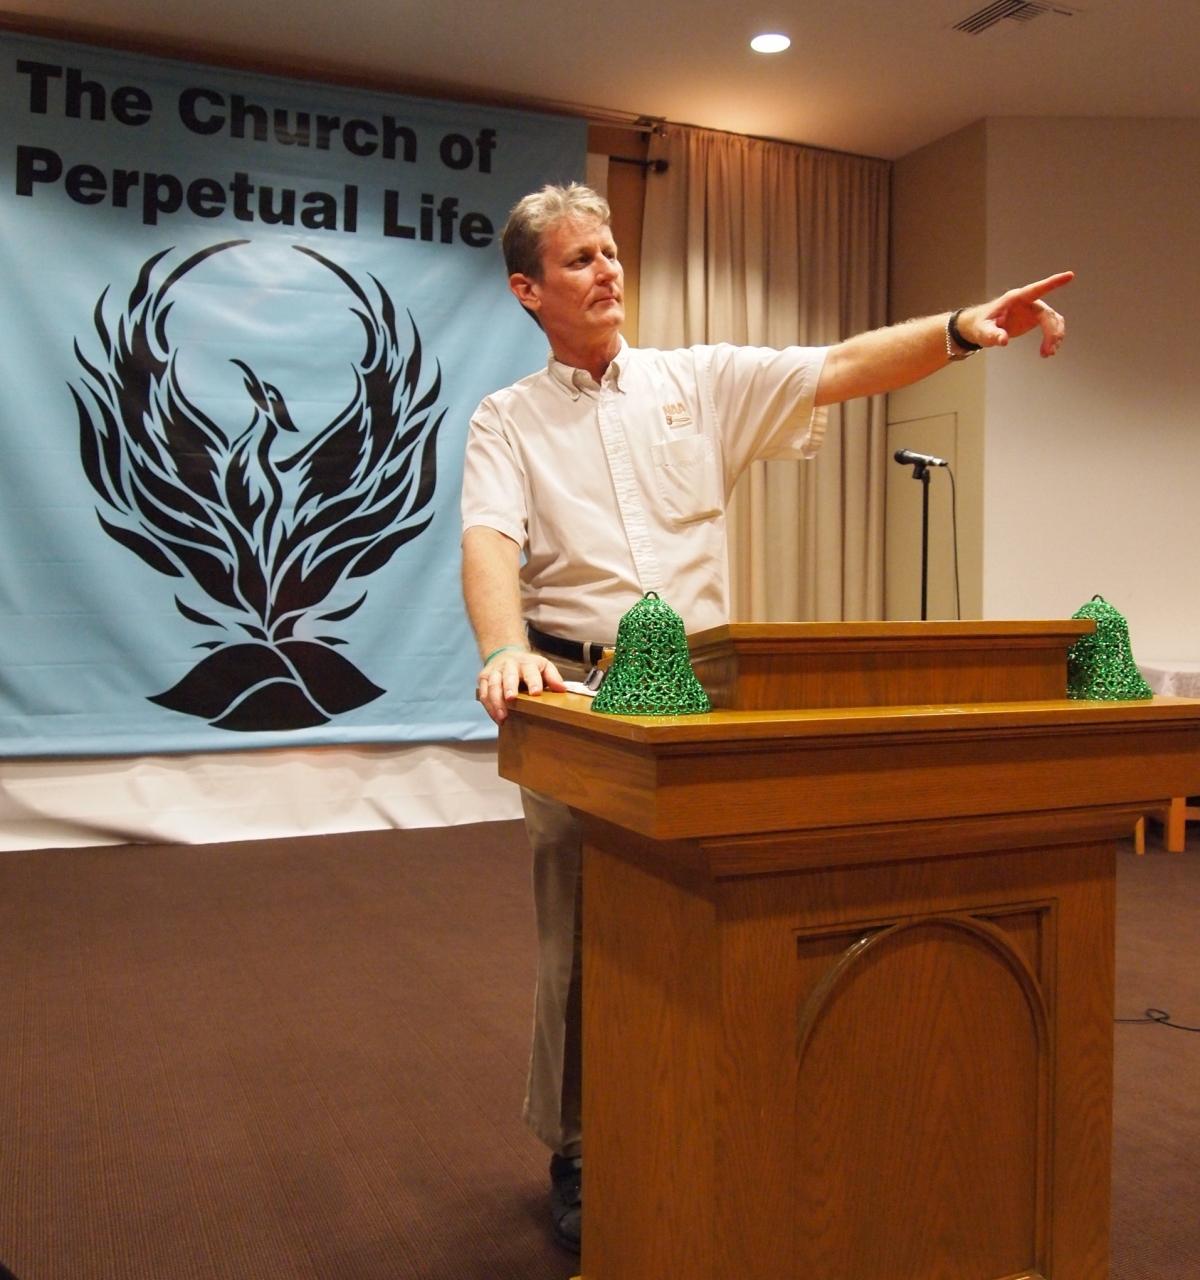 transhumanism religion church perpetual life